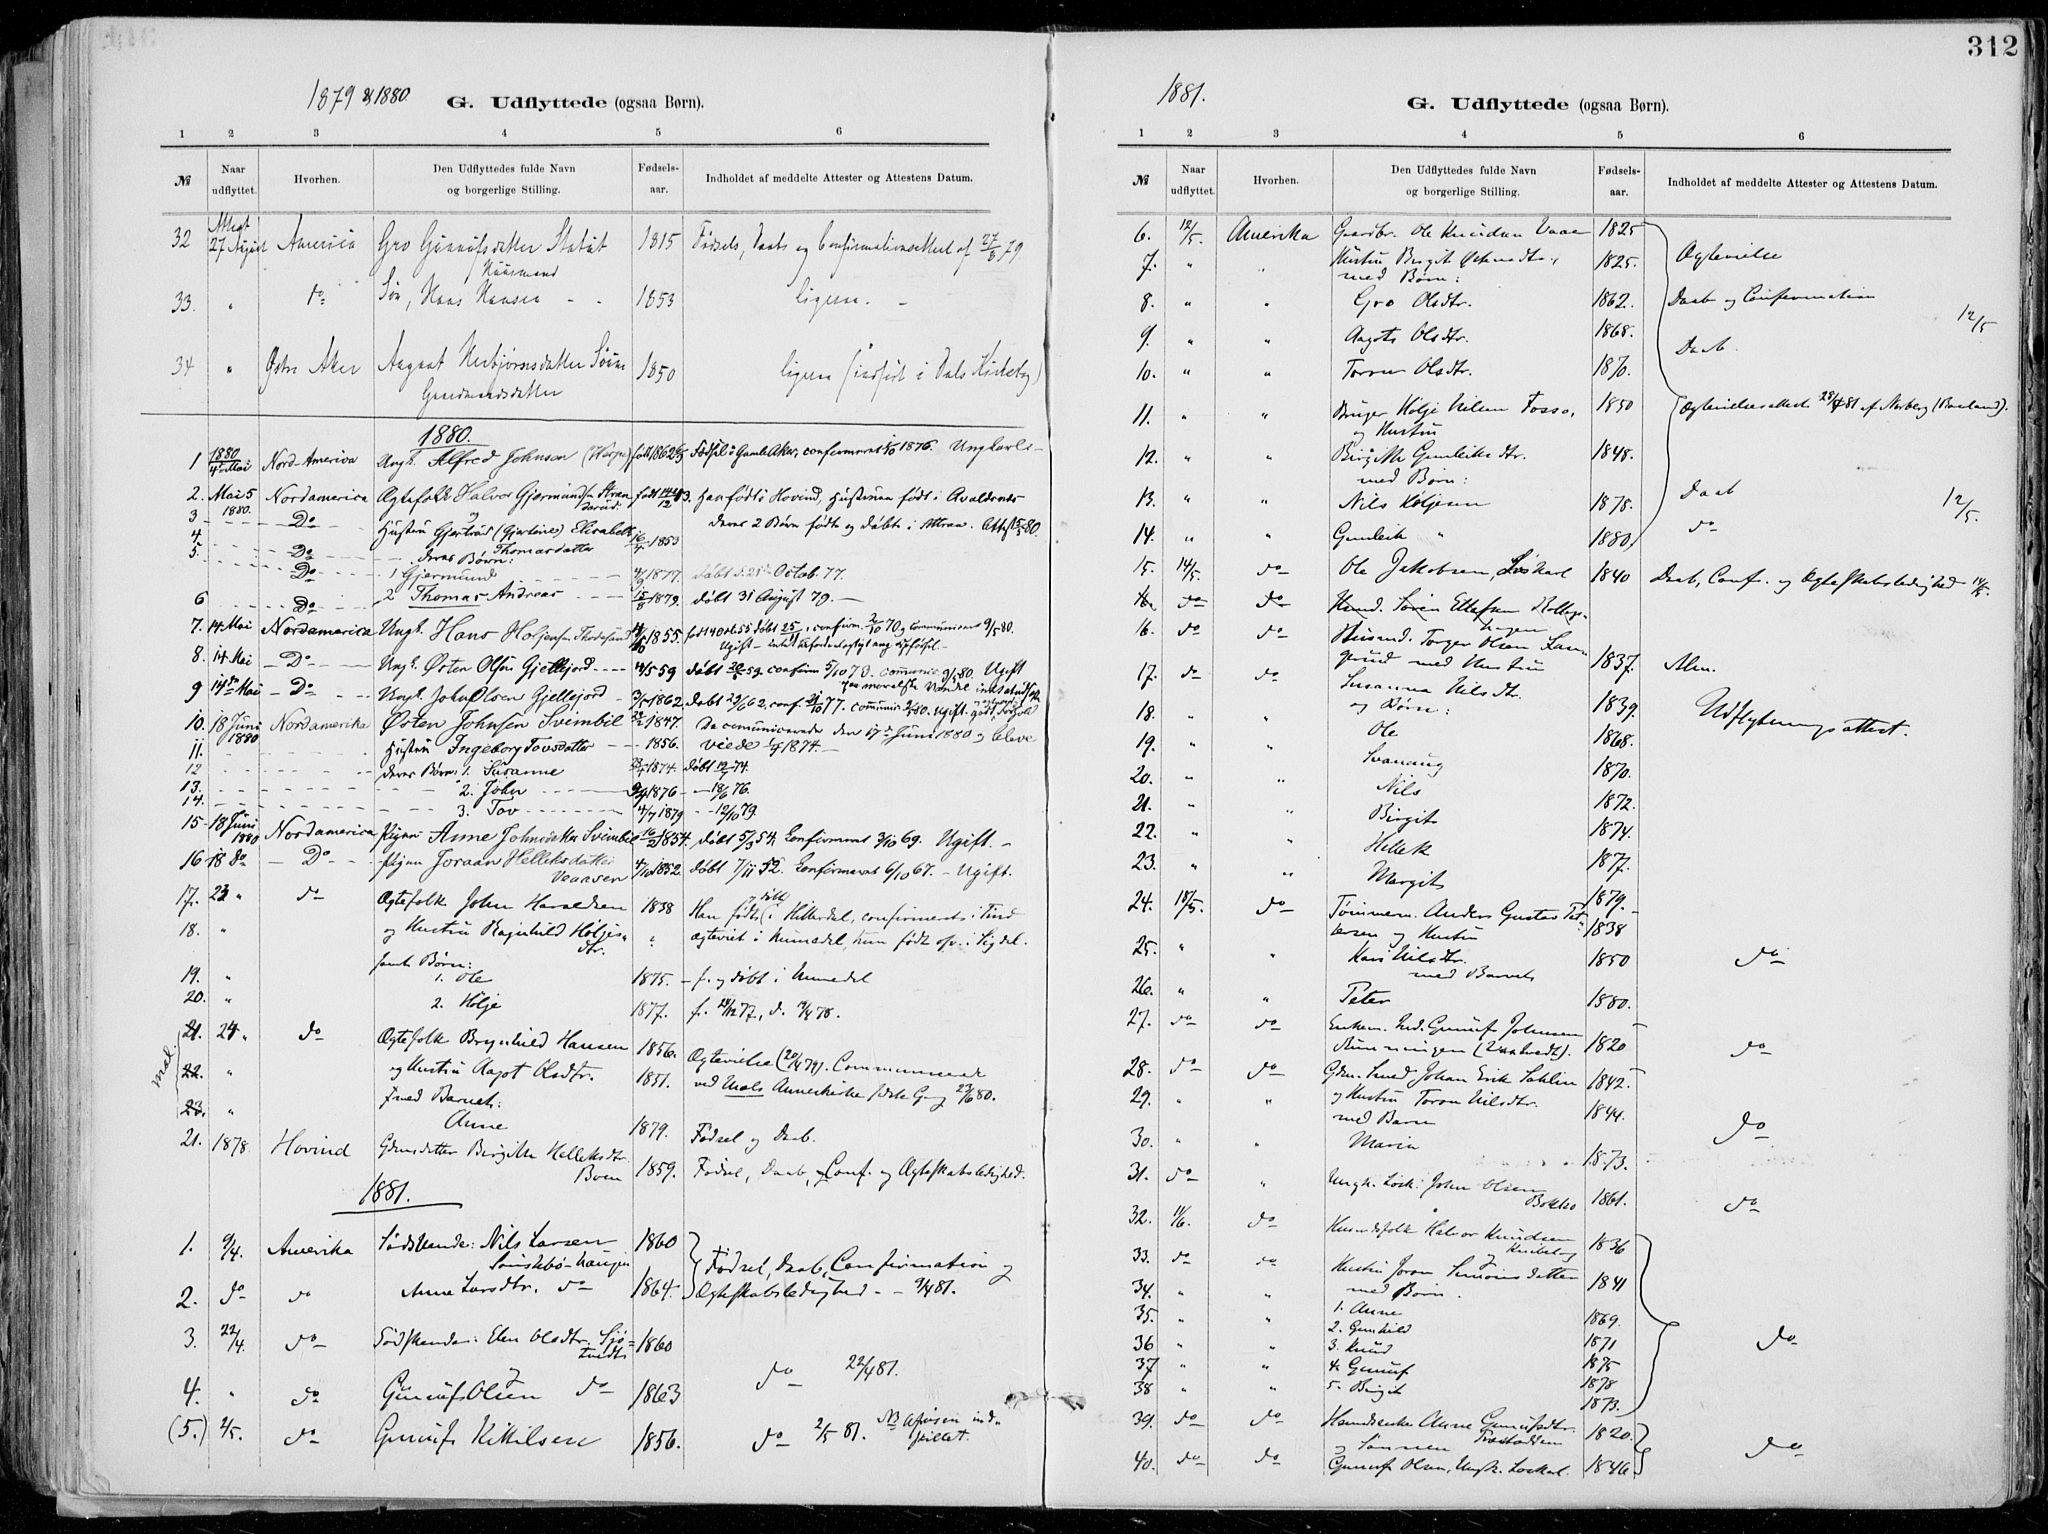 SAKO, Tinn kirkebøker, F/Fa/L0007: Ministerialbok nr. I 7, 1878-1922, s. 312